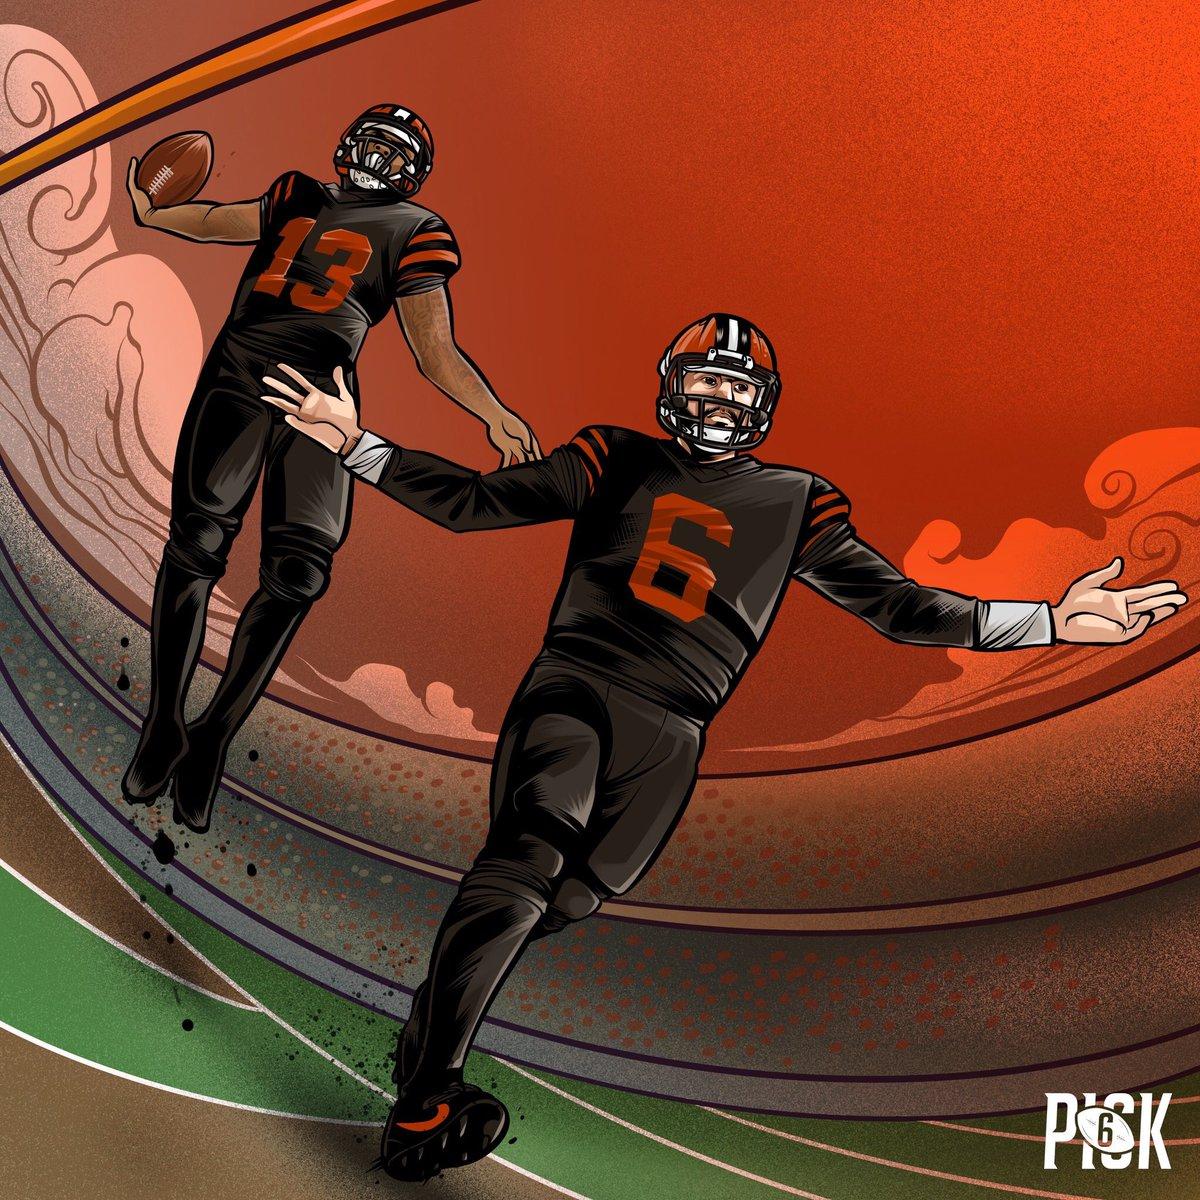 Coming this Fall #Browns @obj @bakermayfield <br>http://pic.twitter.com/sK2bD9vmBu